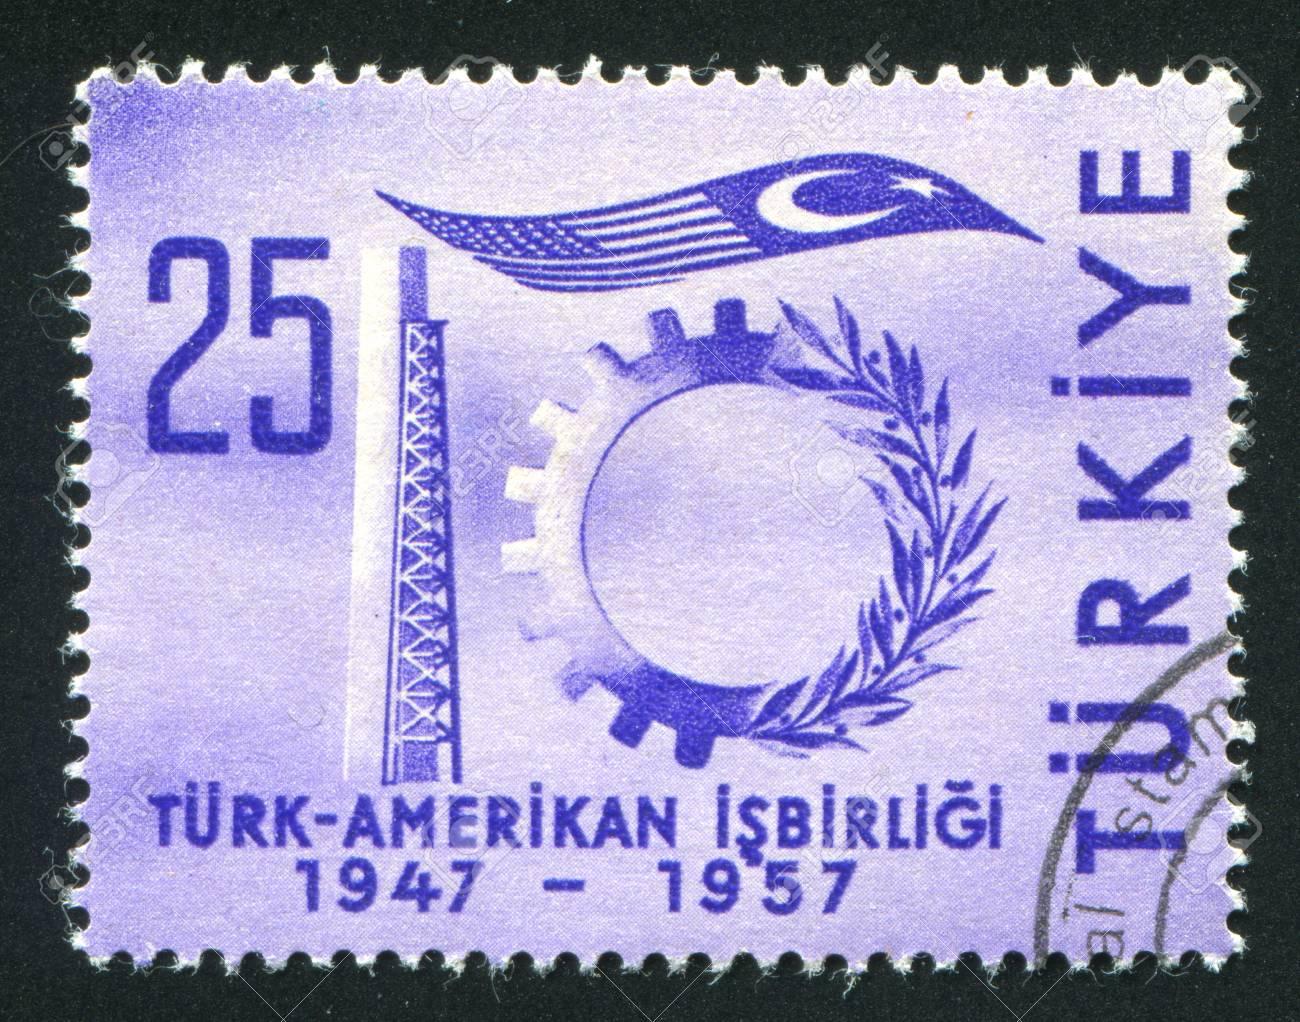 Turkey Circa 1957 Stamp Printed By Turkey Shows Symbols Of